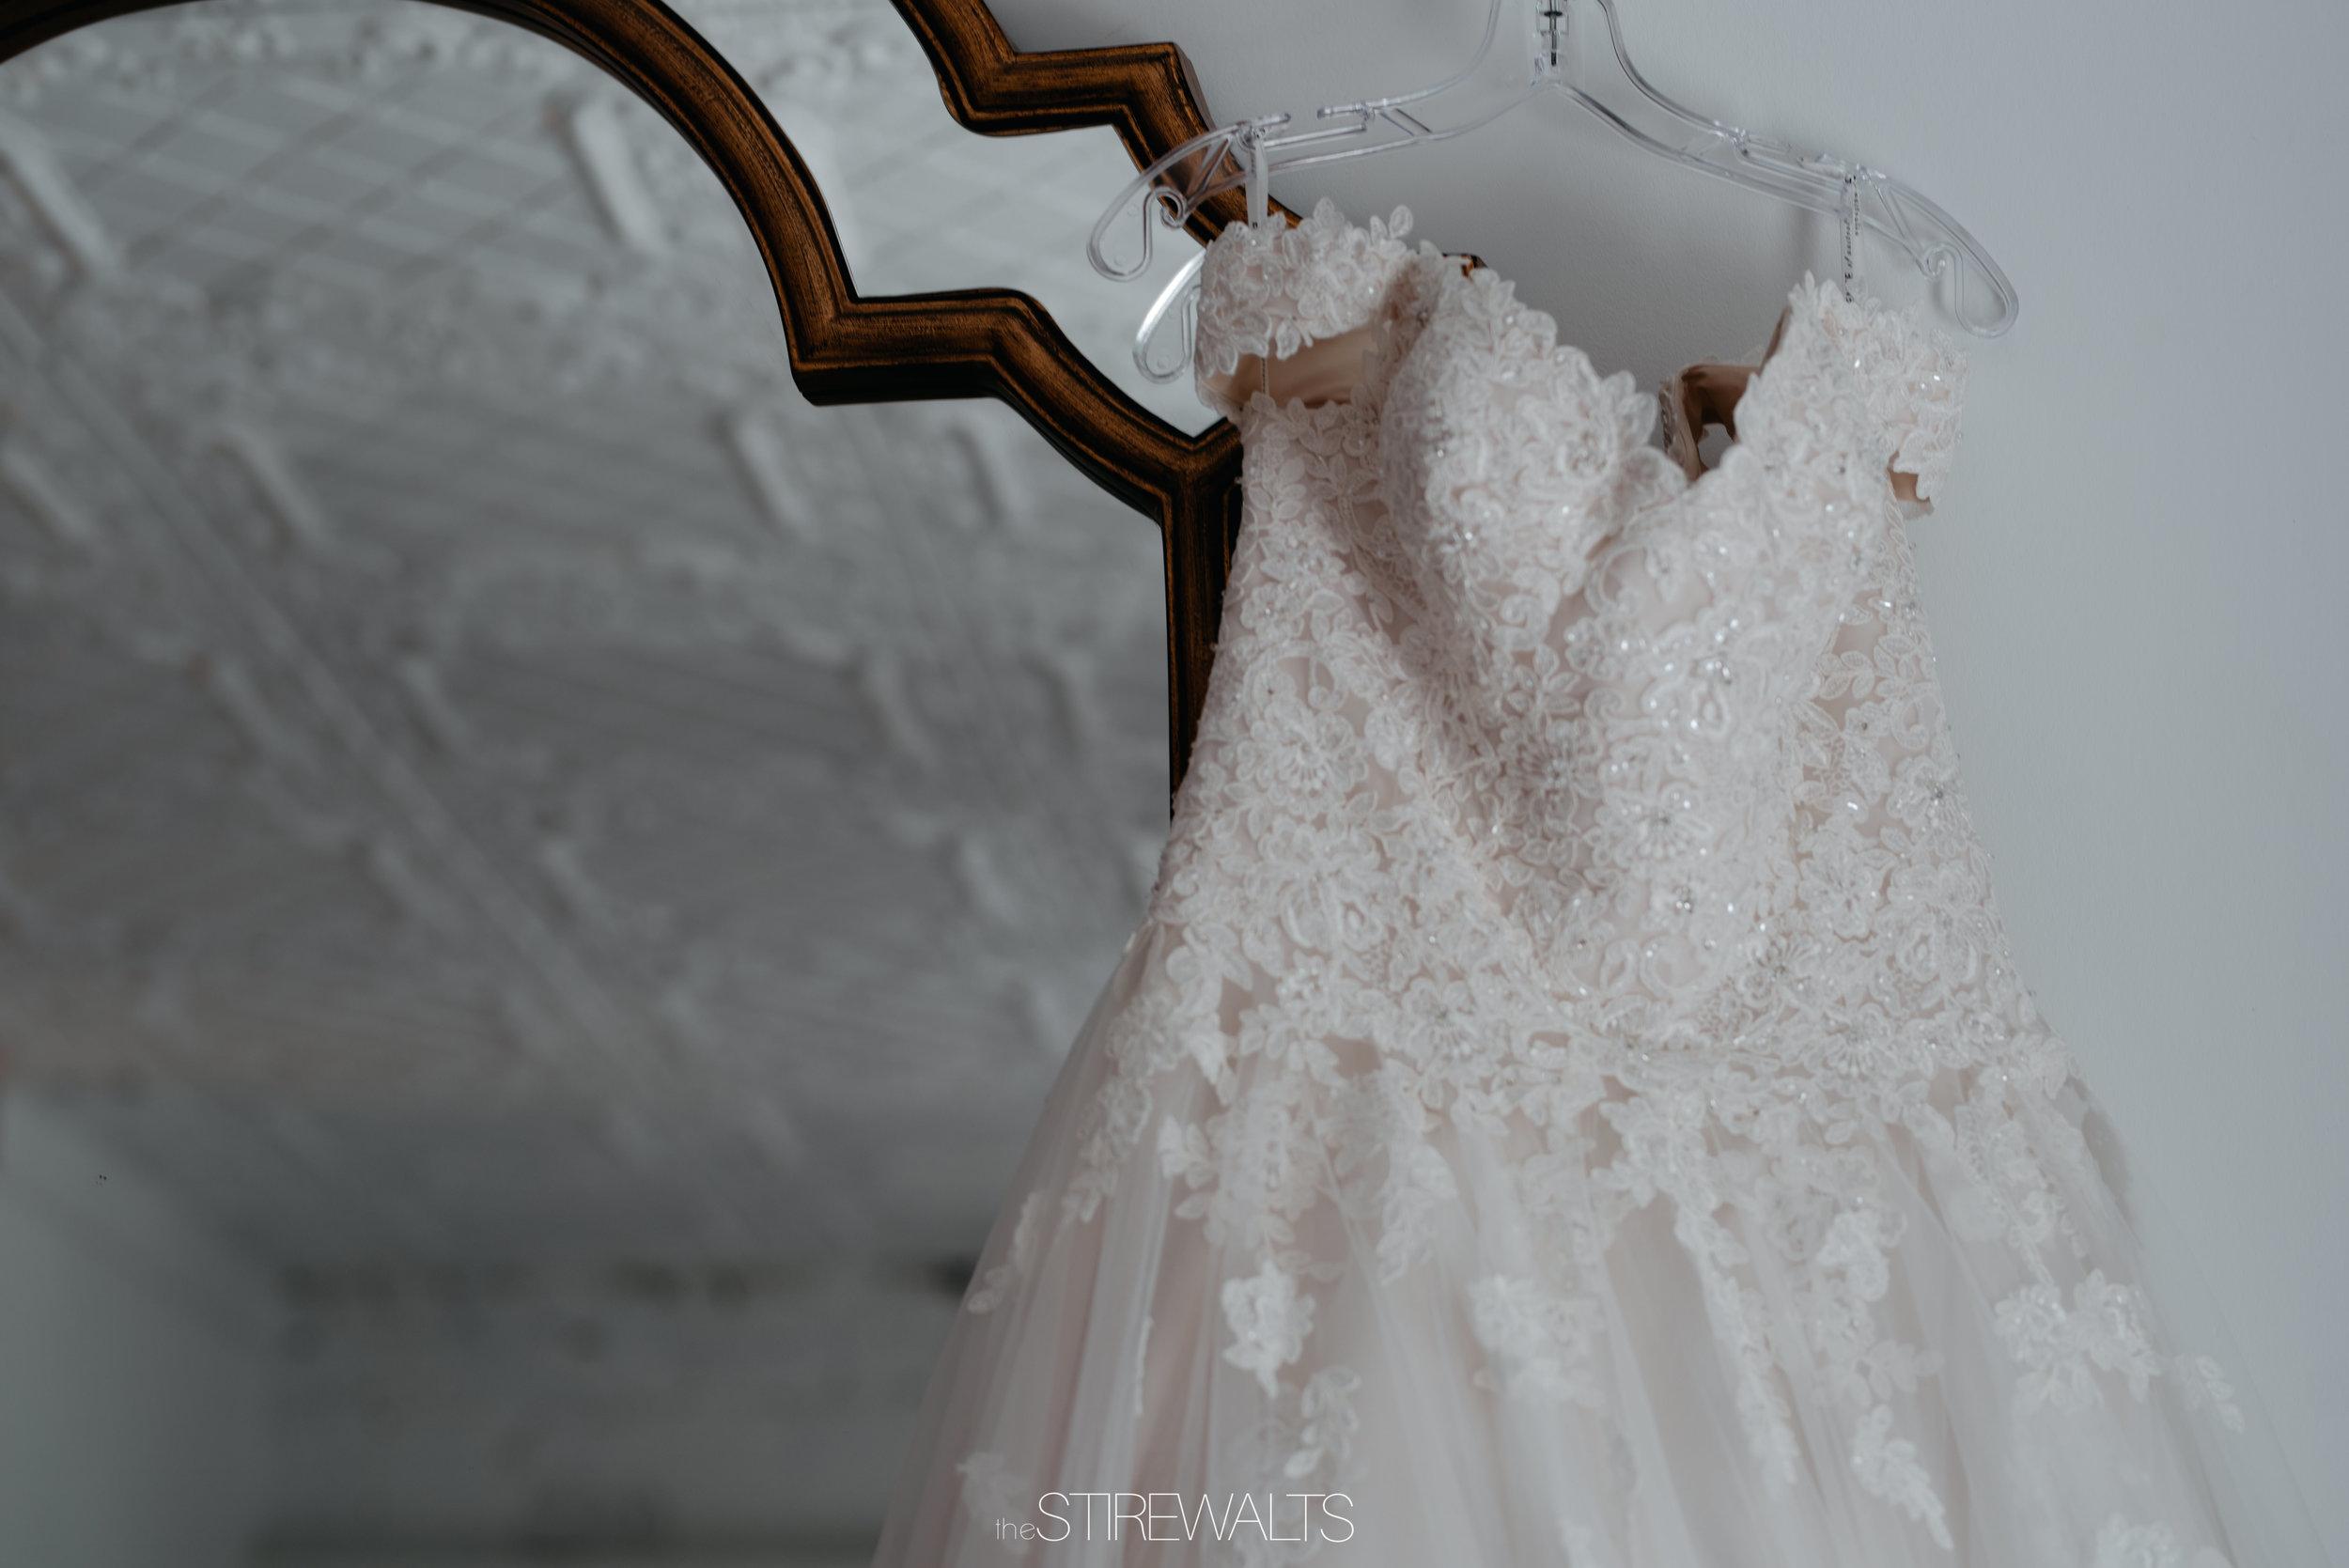 Sara.Jon.Wedding.Blog.2018.©TheStirewalts-8.jpg